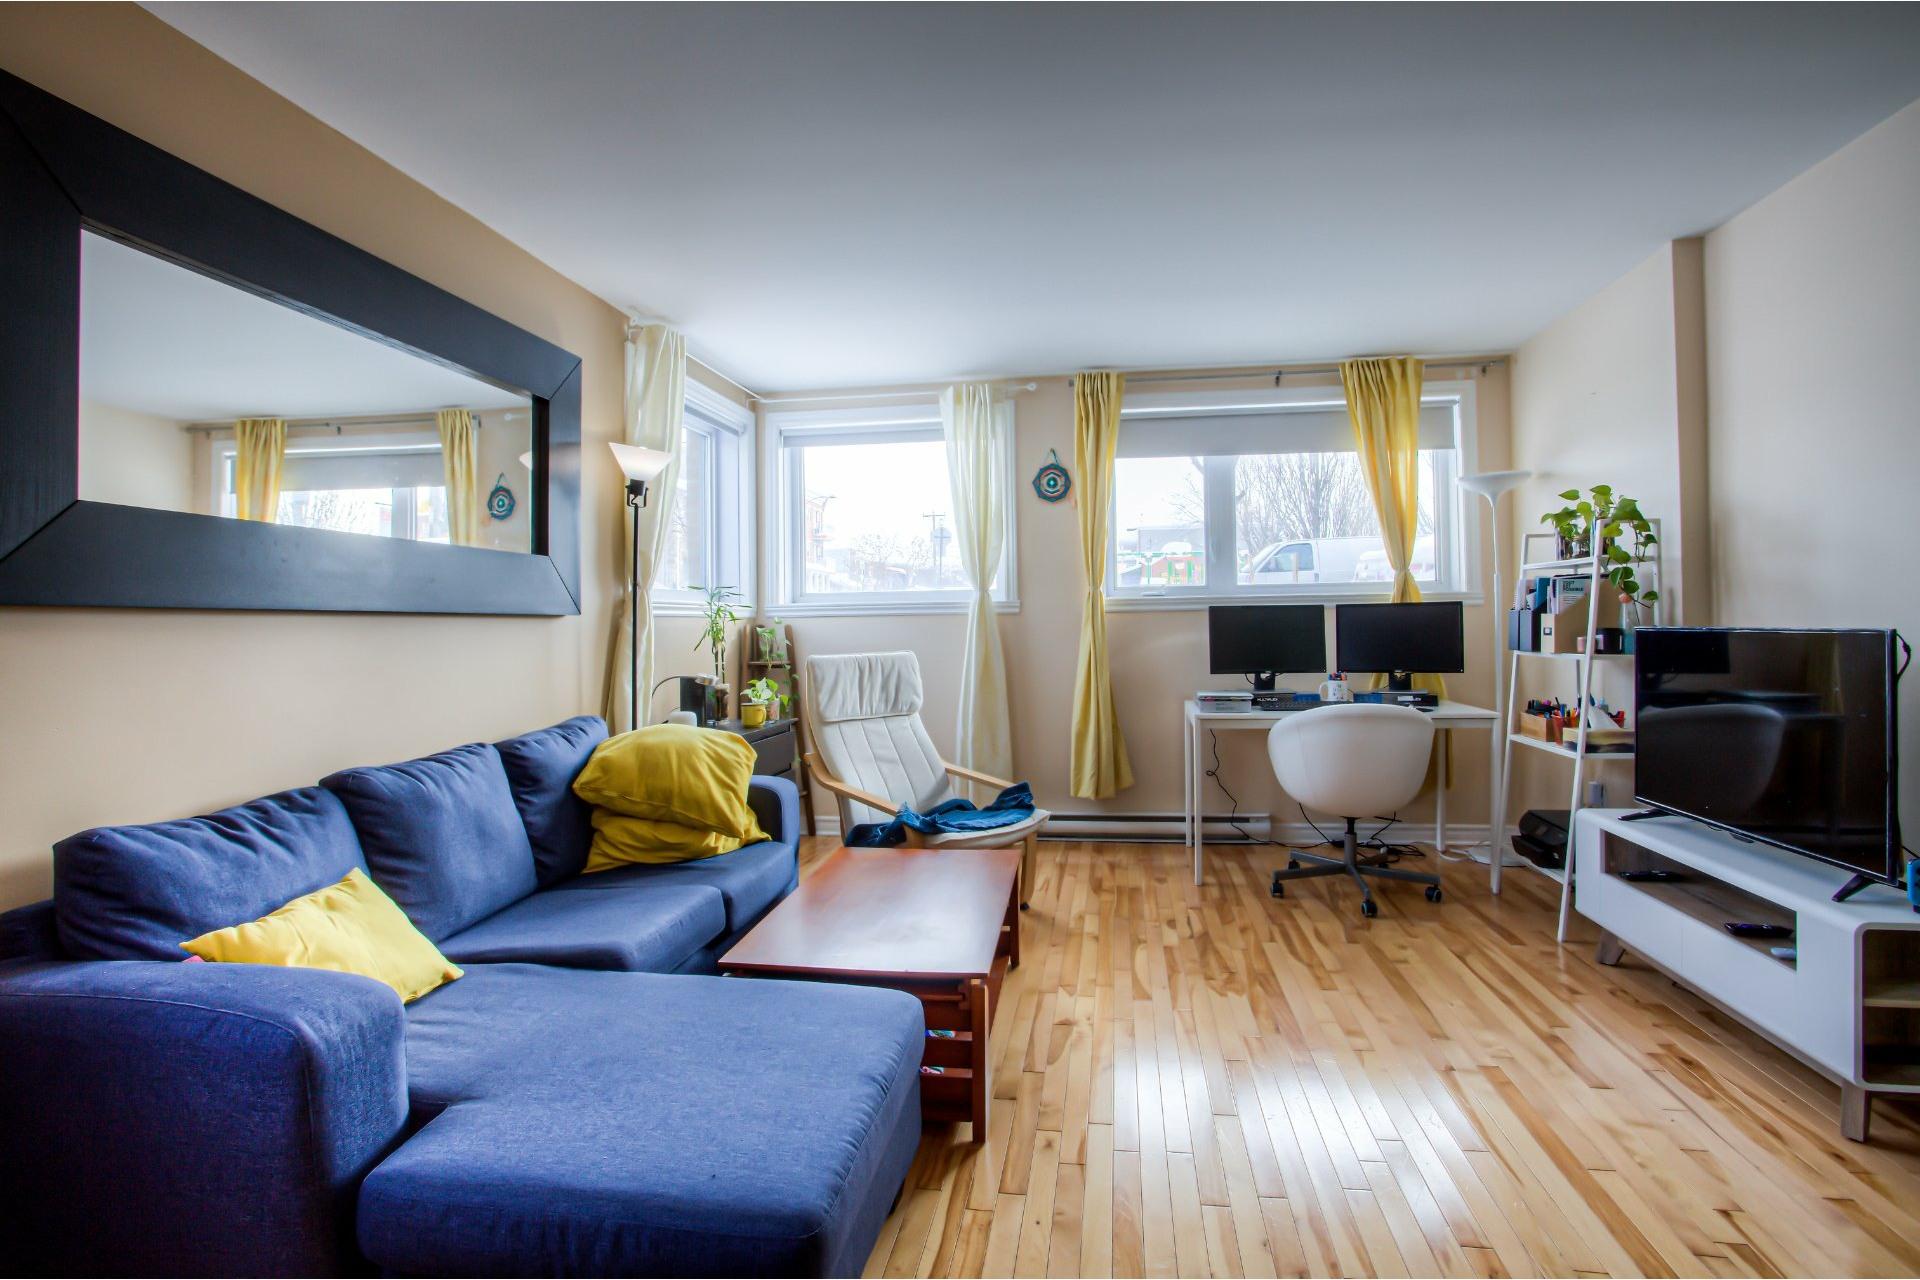 image 4 - Departamento Para alquiler Villeray/Saint-Michel/Parc-Extension Montréal  - 5 habitaciones